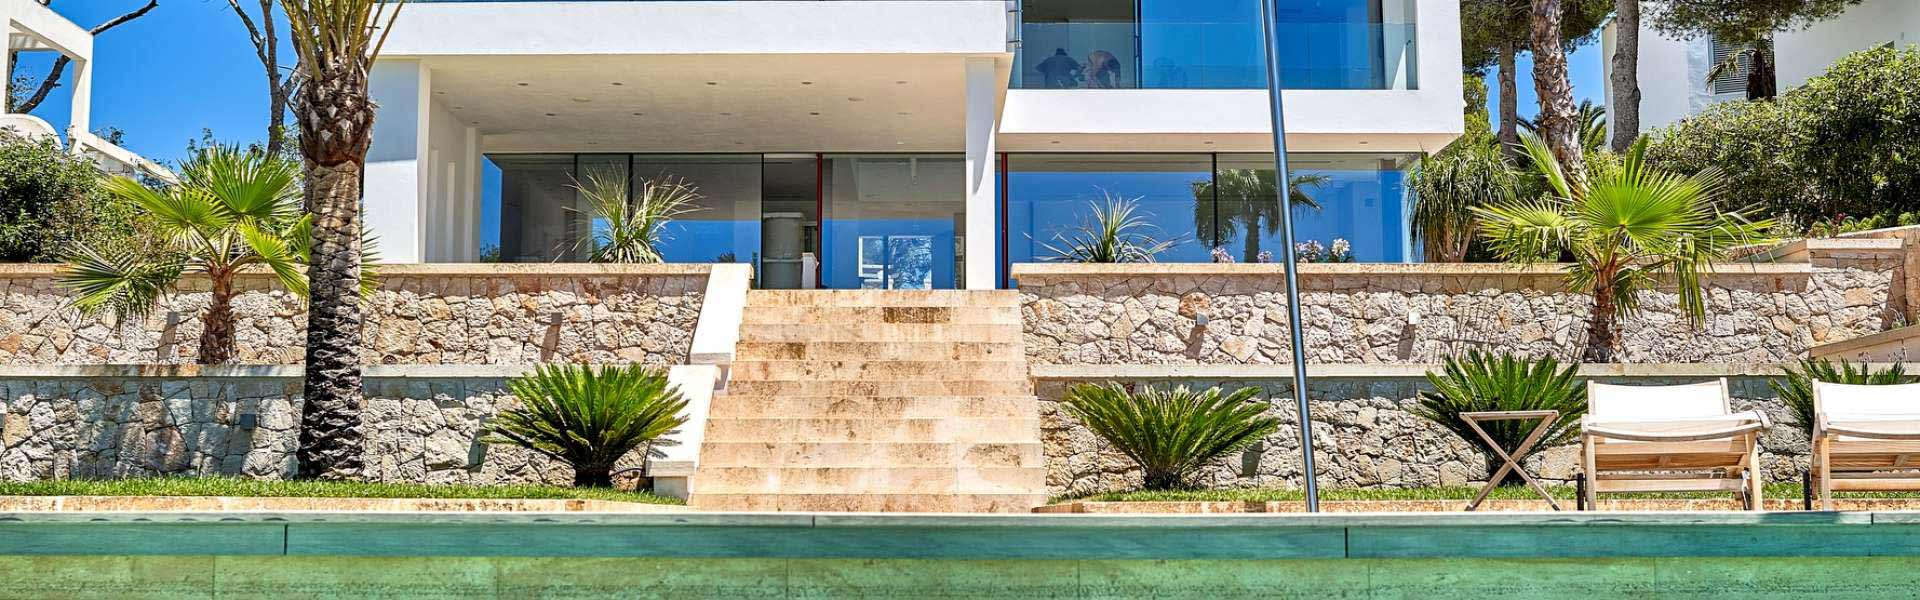 Montemar Immobilien Mallorca - Designervilla auf Mallorca